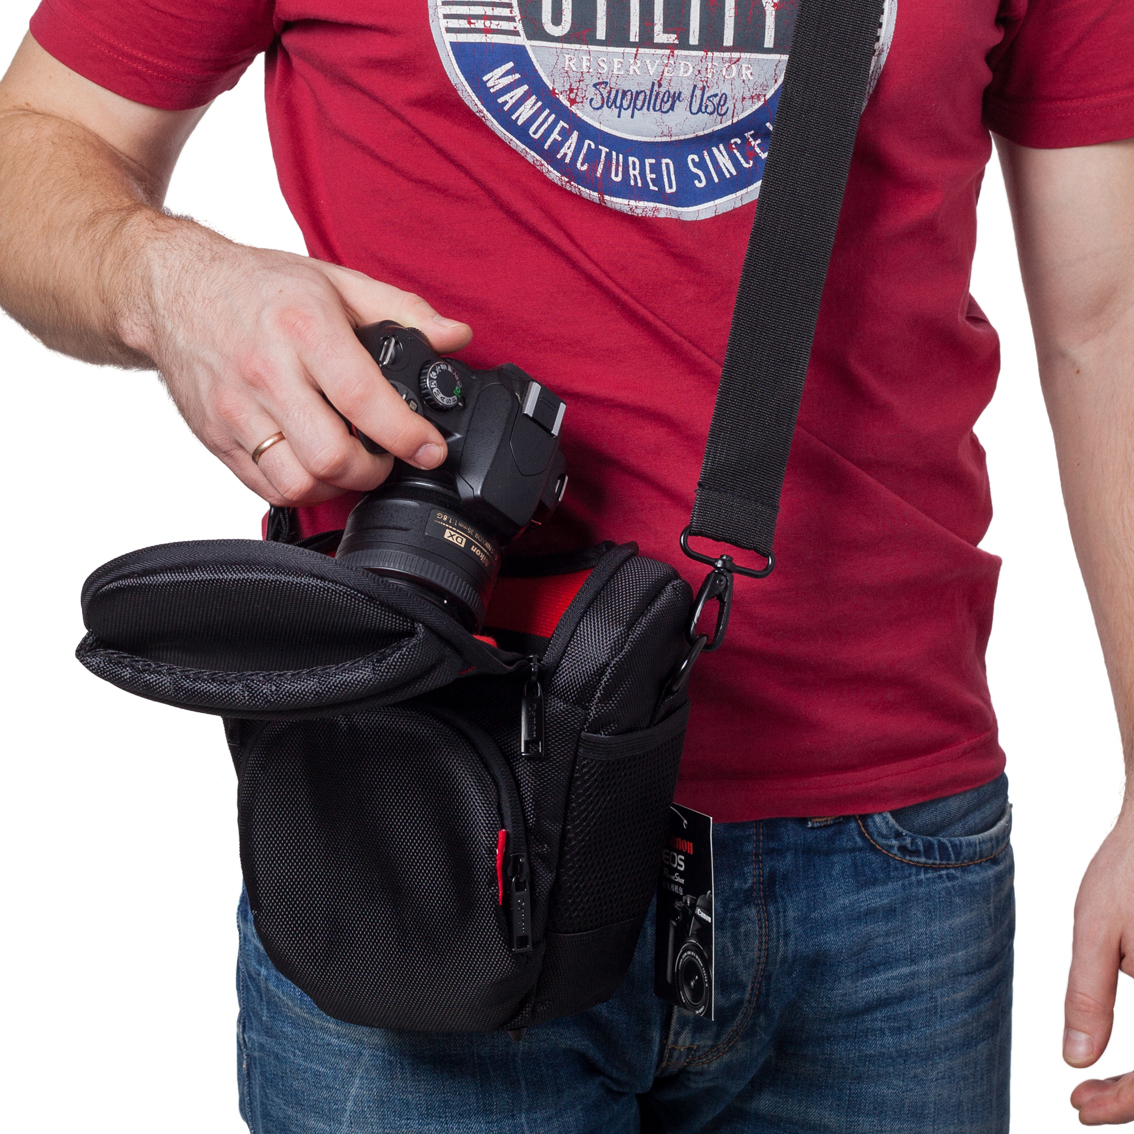 42ecc1cdf049 Сумка для фотоаппарата Canon 1100D • 1200D за 990 руб на ...